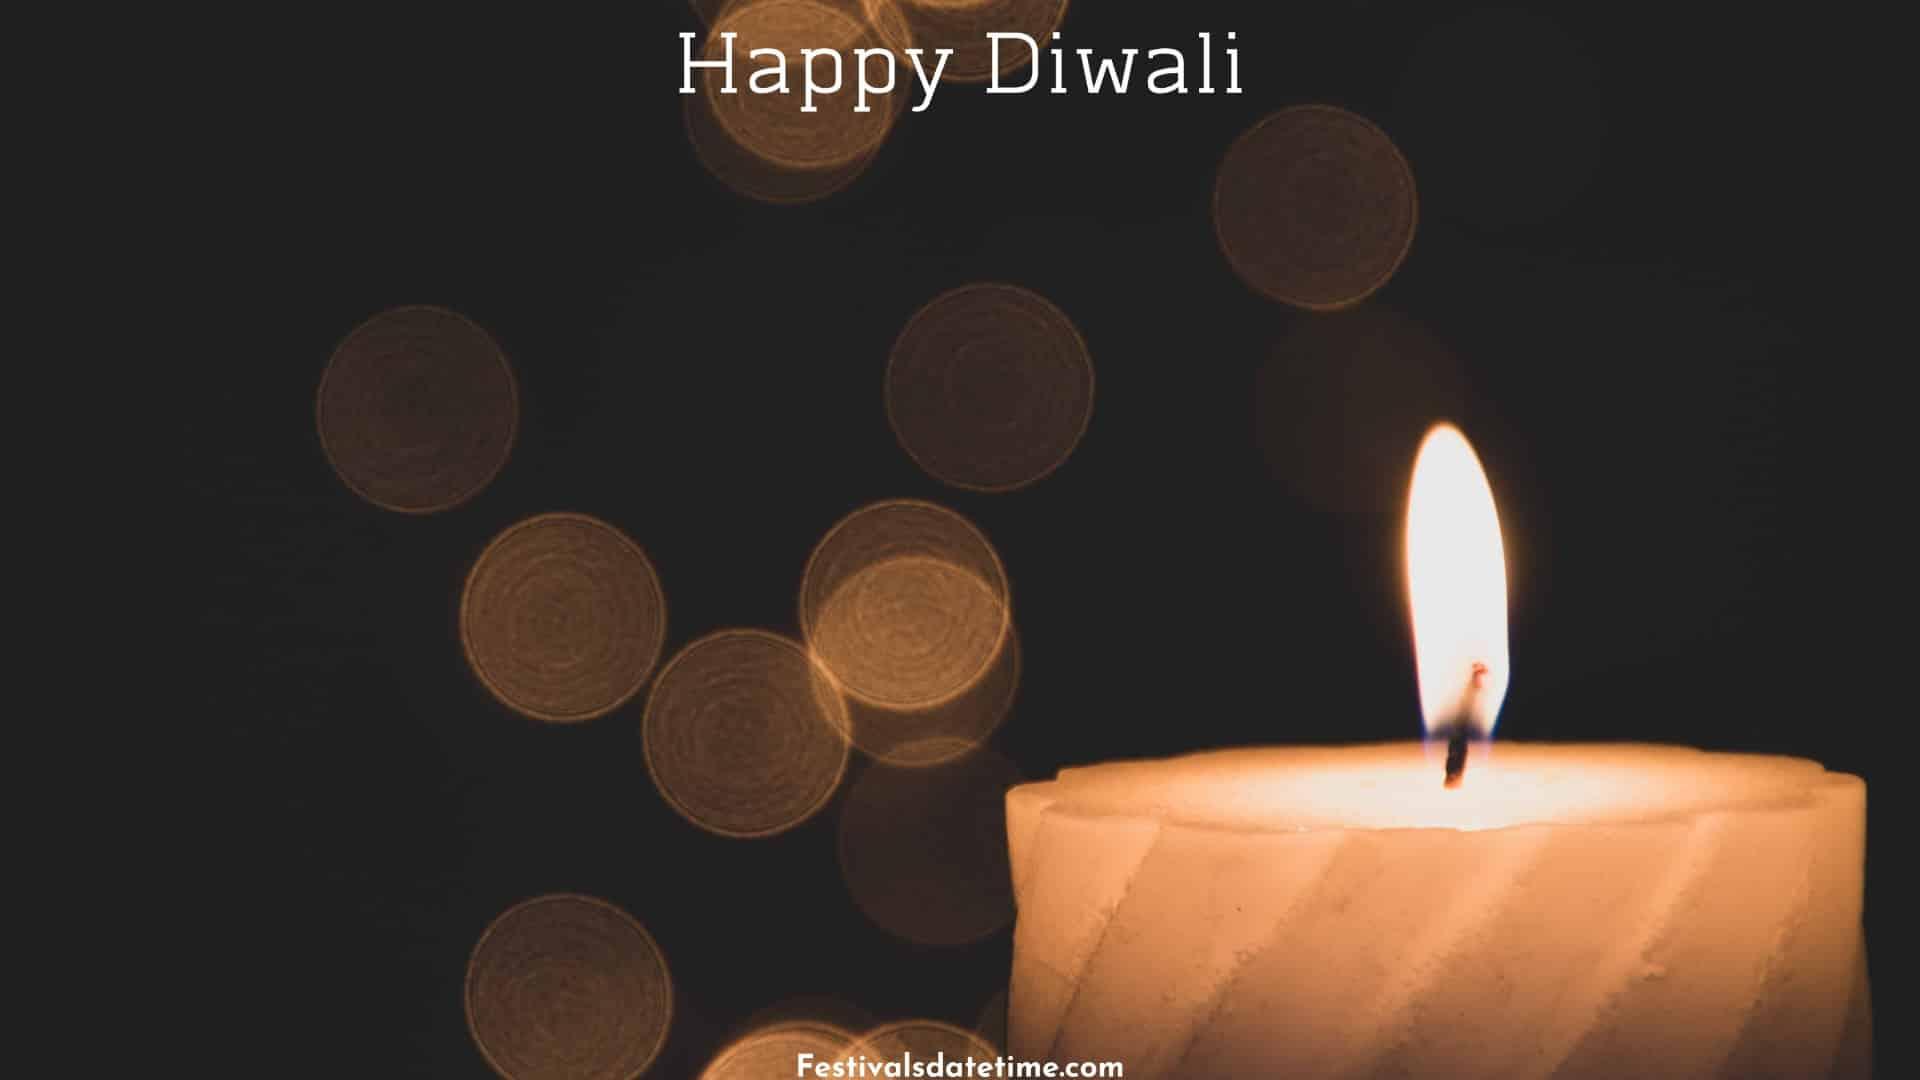 Diwali Wallpapers Download For Mobile Desktop Festivals Date 1920x1080